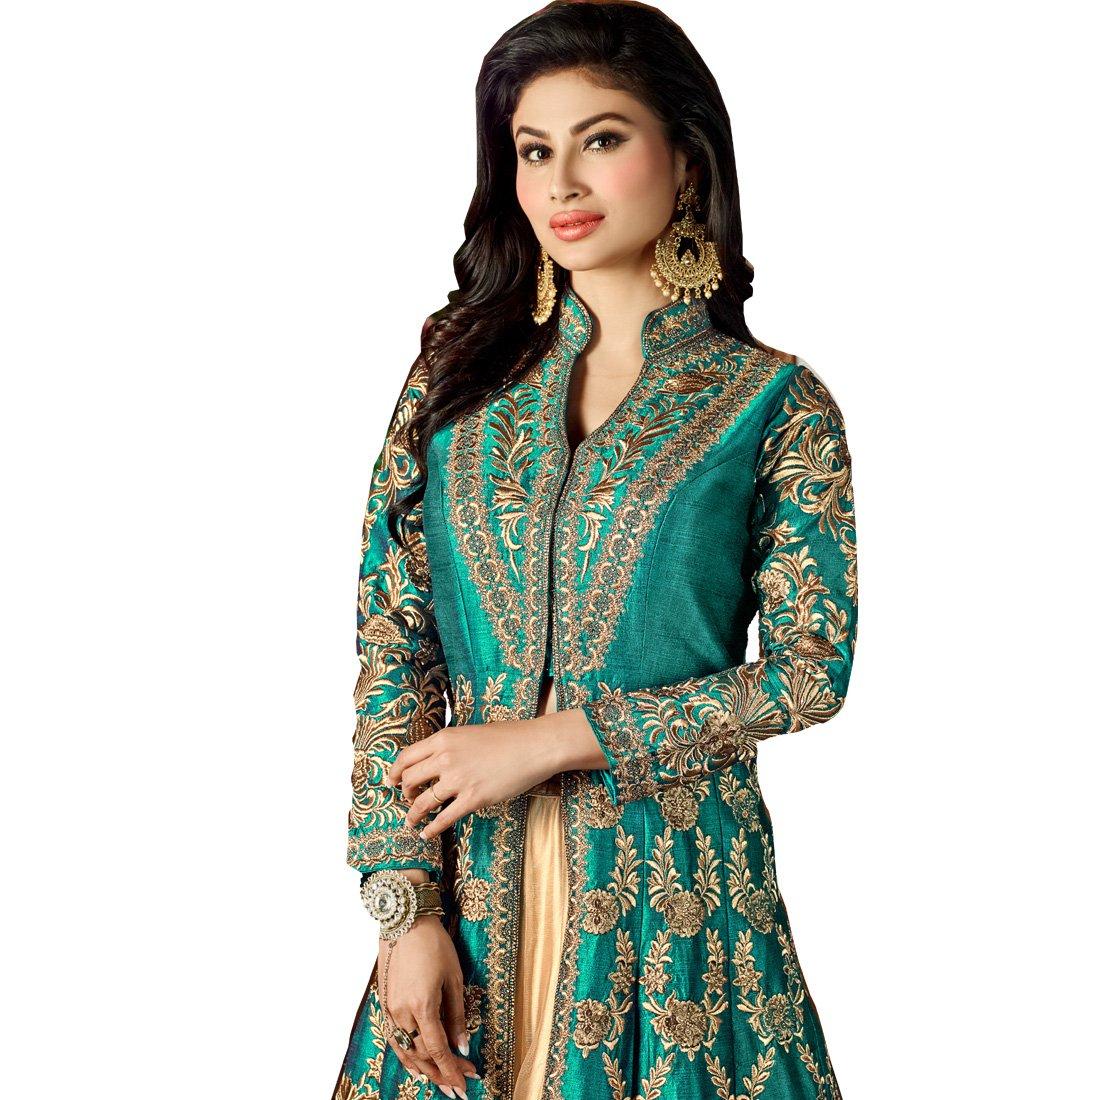 196d564918b Vasu Saree Women s Heavy Tapeta Silk Semi-Stitched Anarkali Suit  (Shashi6-12047 Teal Xx-Large)  Amazon.in  Clothing   Accessories